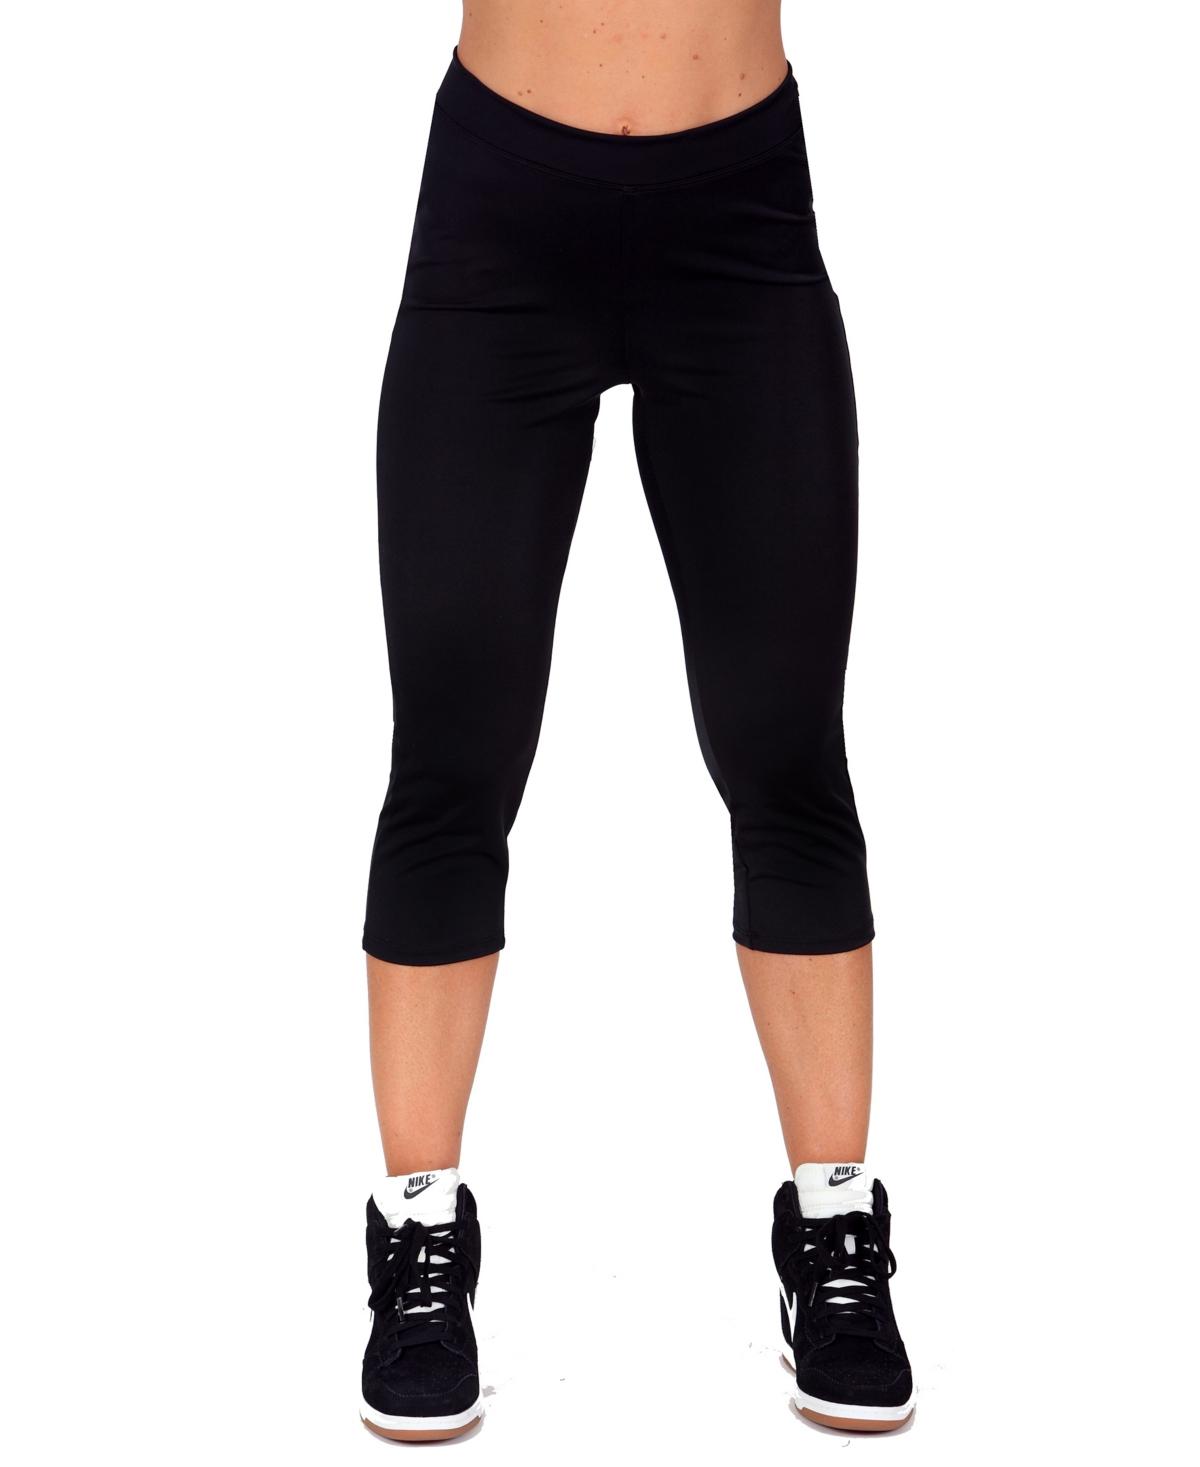 InstantFigure Women's Active Capri Pant